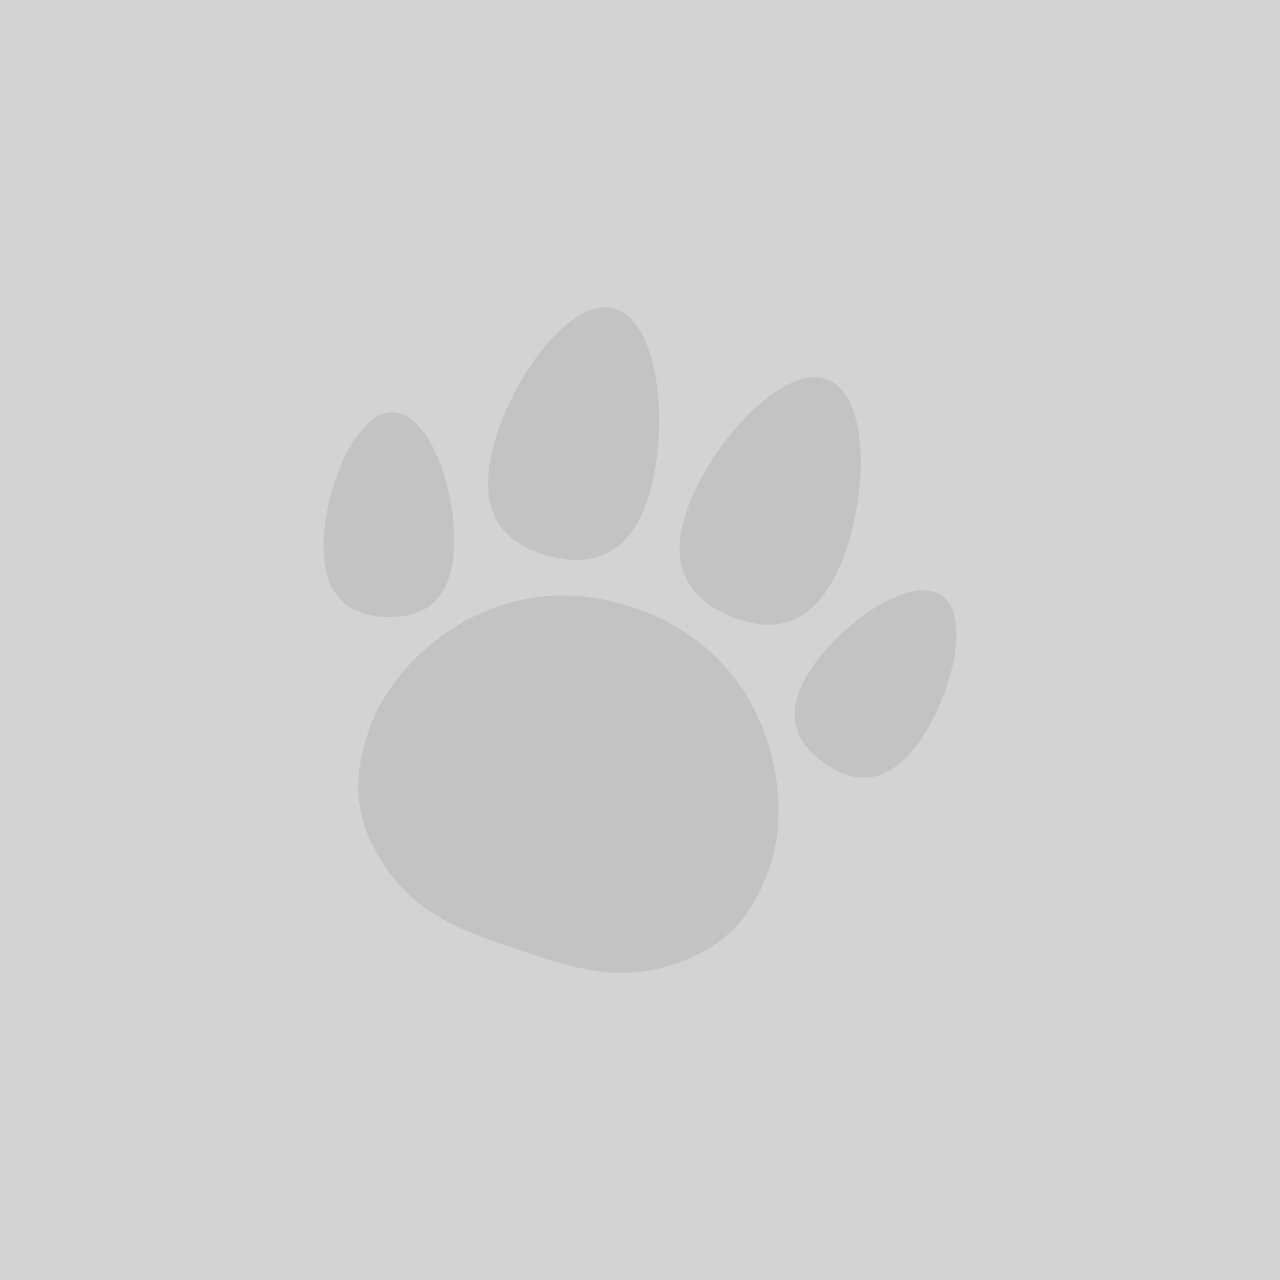 K9 Optimum Adult Dog Large Breed Chicken (2 Size Options)